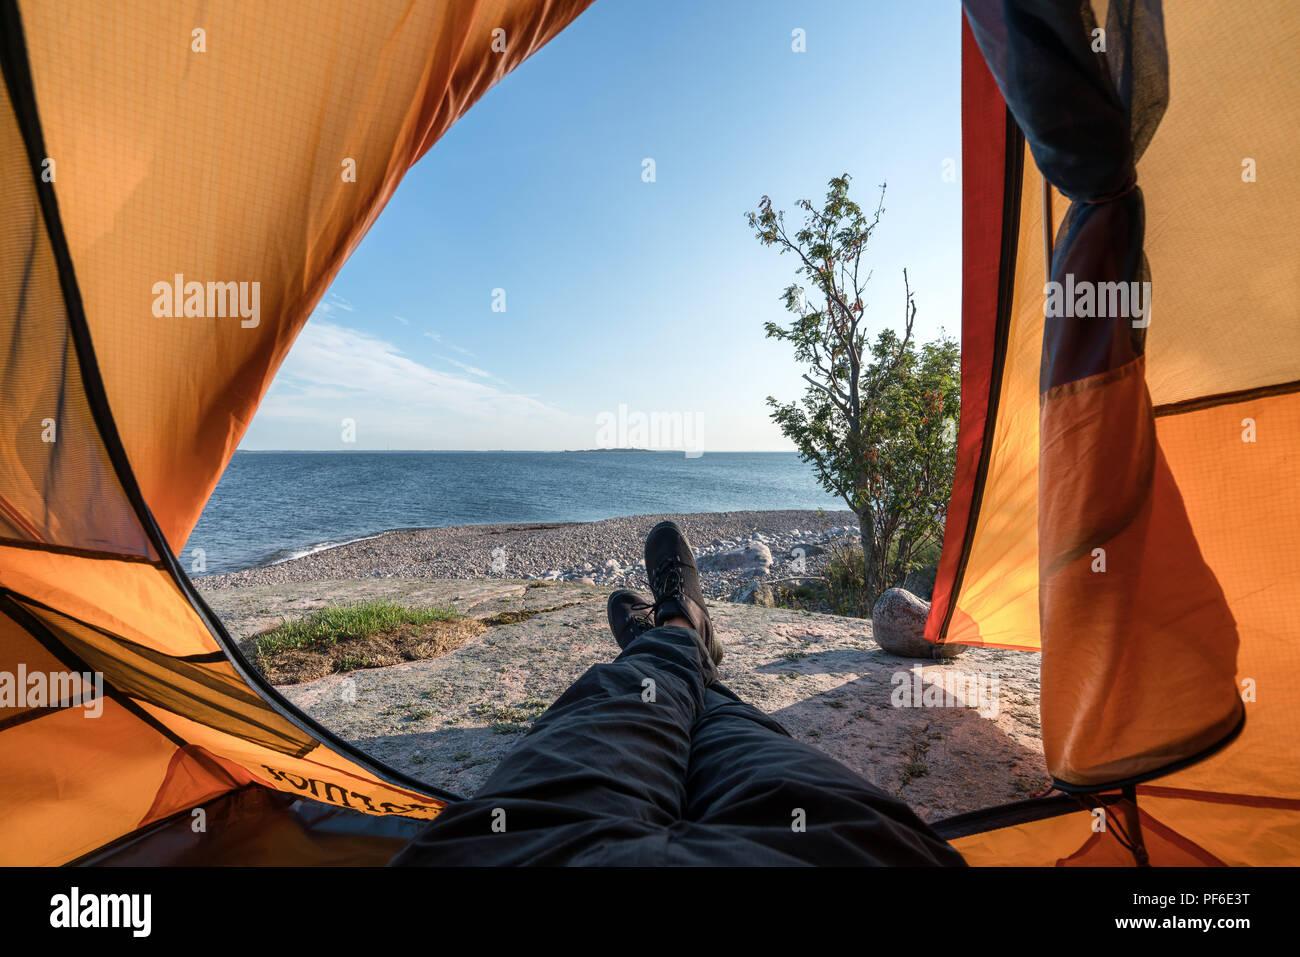 Rilassarsi e godersi la vista a Örskär isola, Kirkkonummi, Finlandia, Europa, UE Immagini Stock